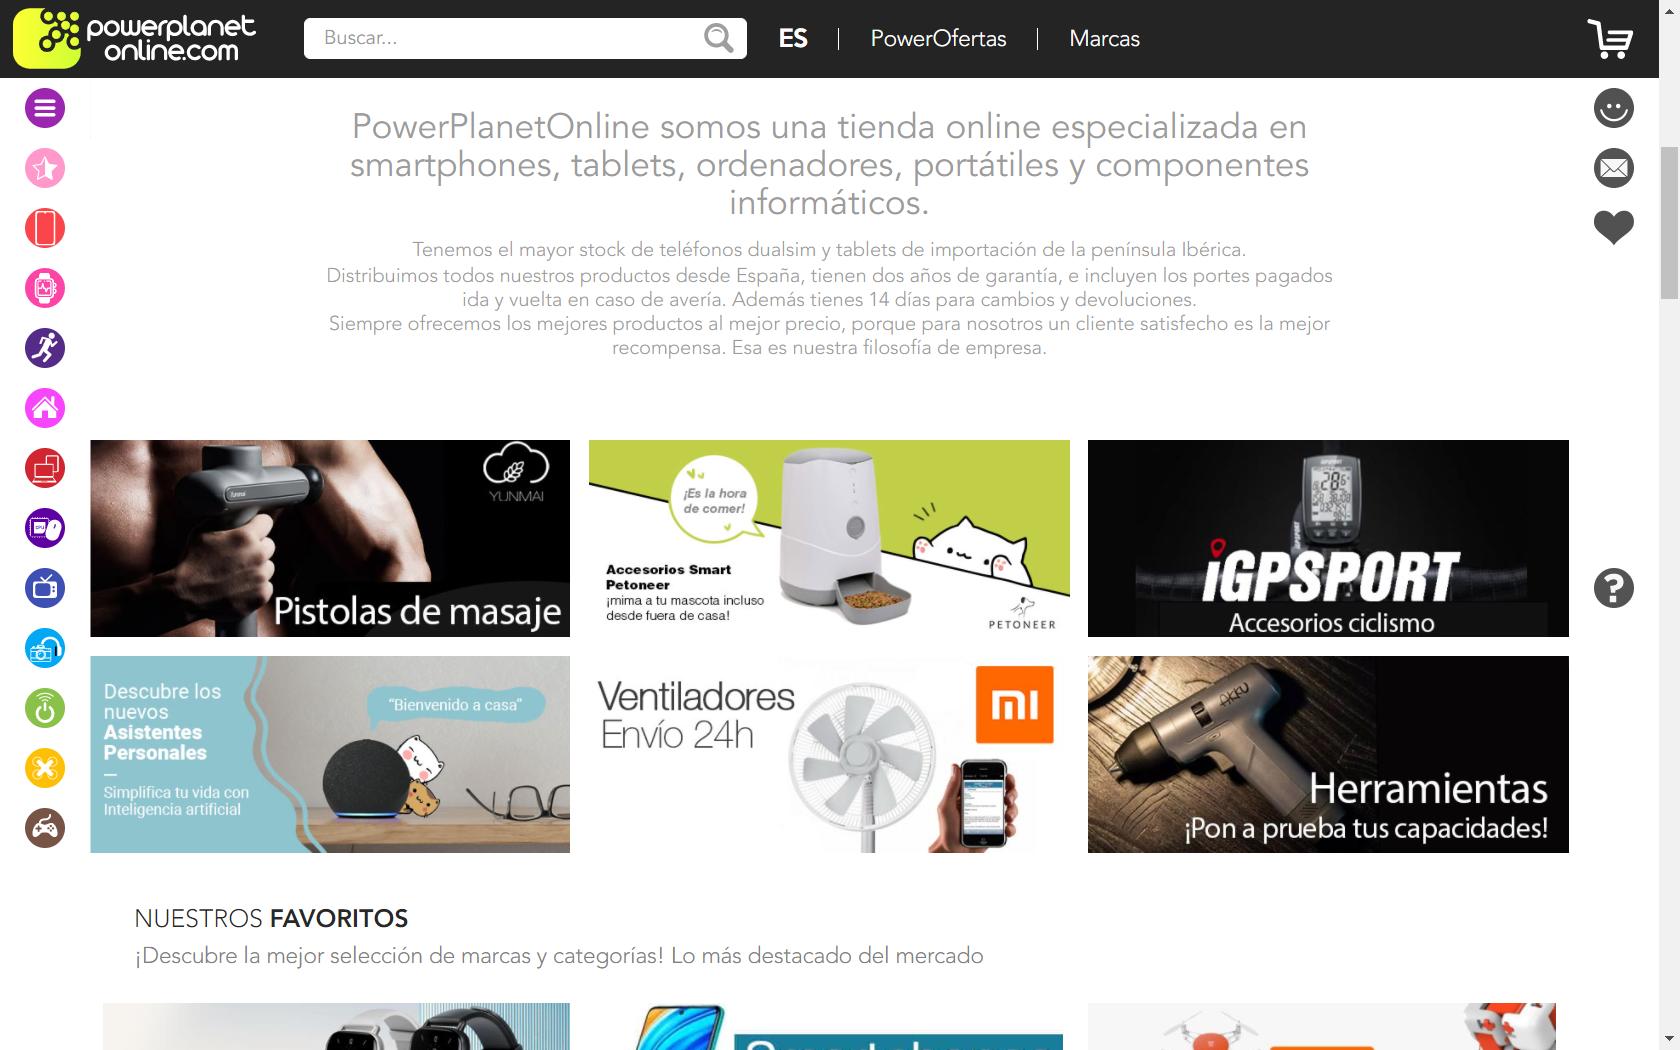 Captura de pantalla de la web de PowerPlanetOnline